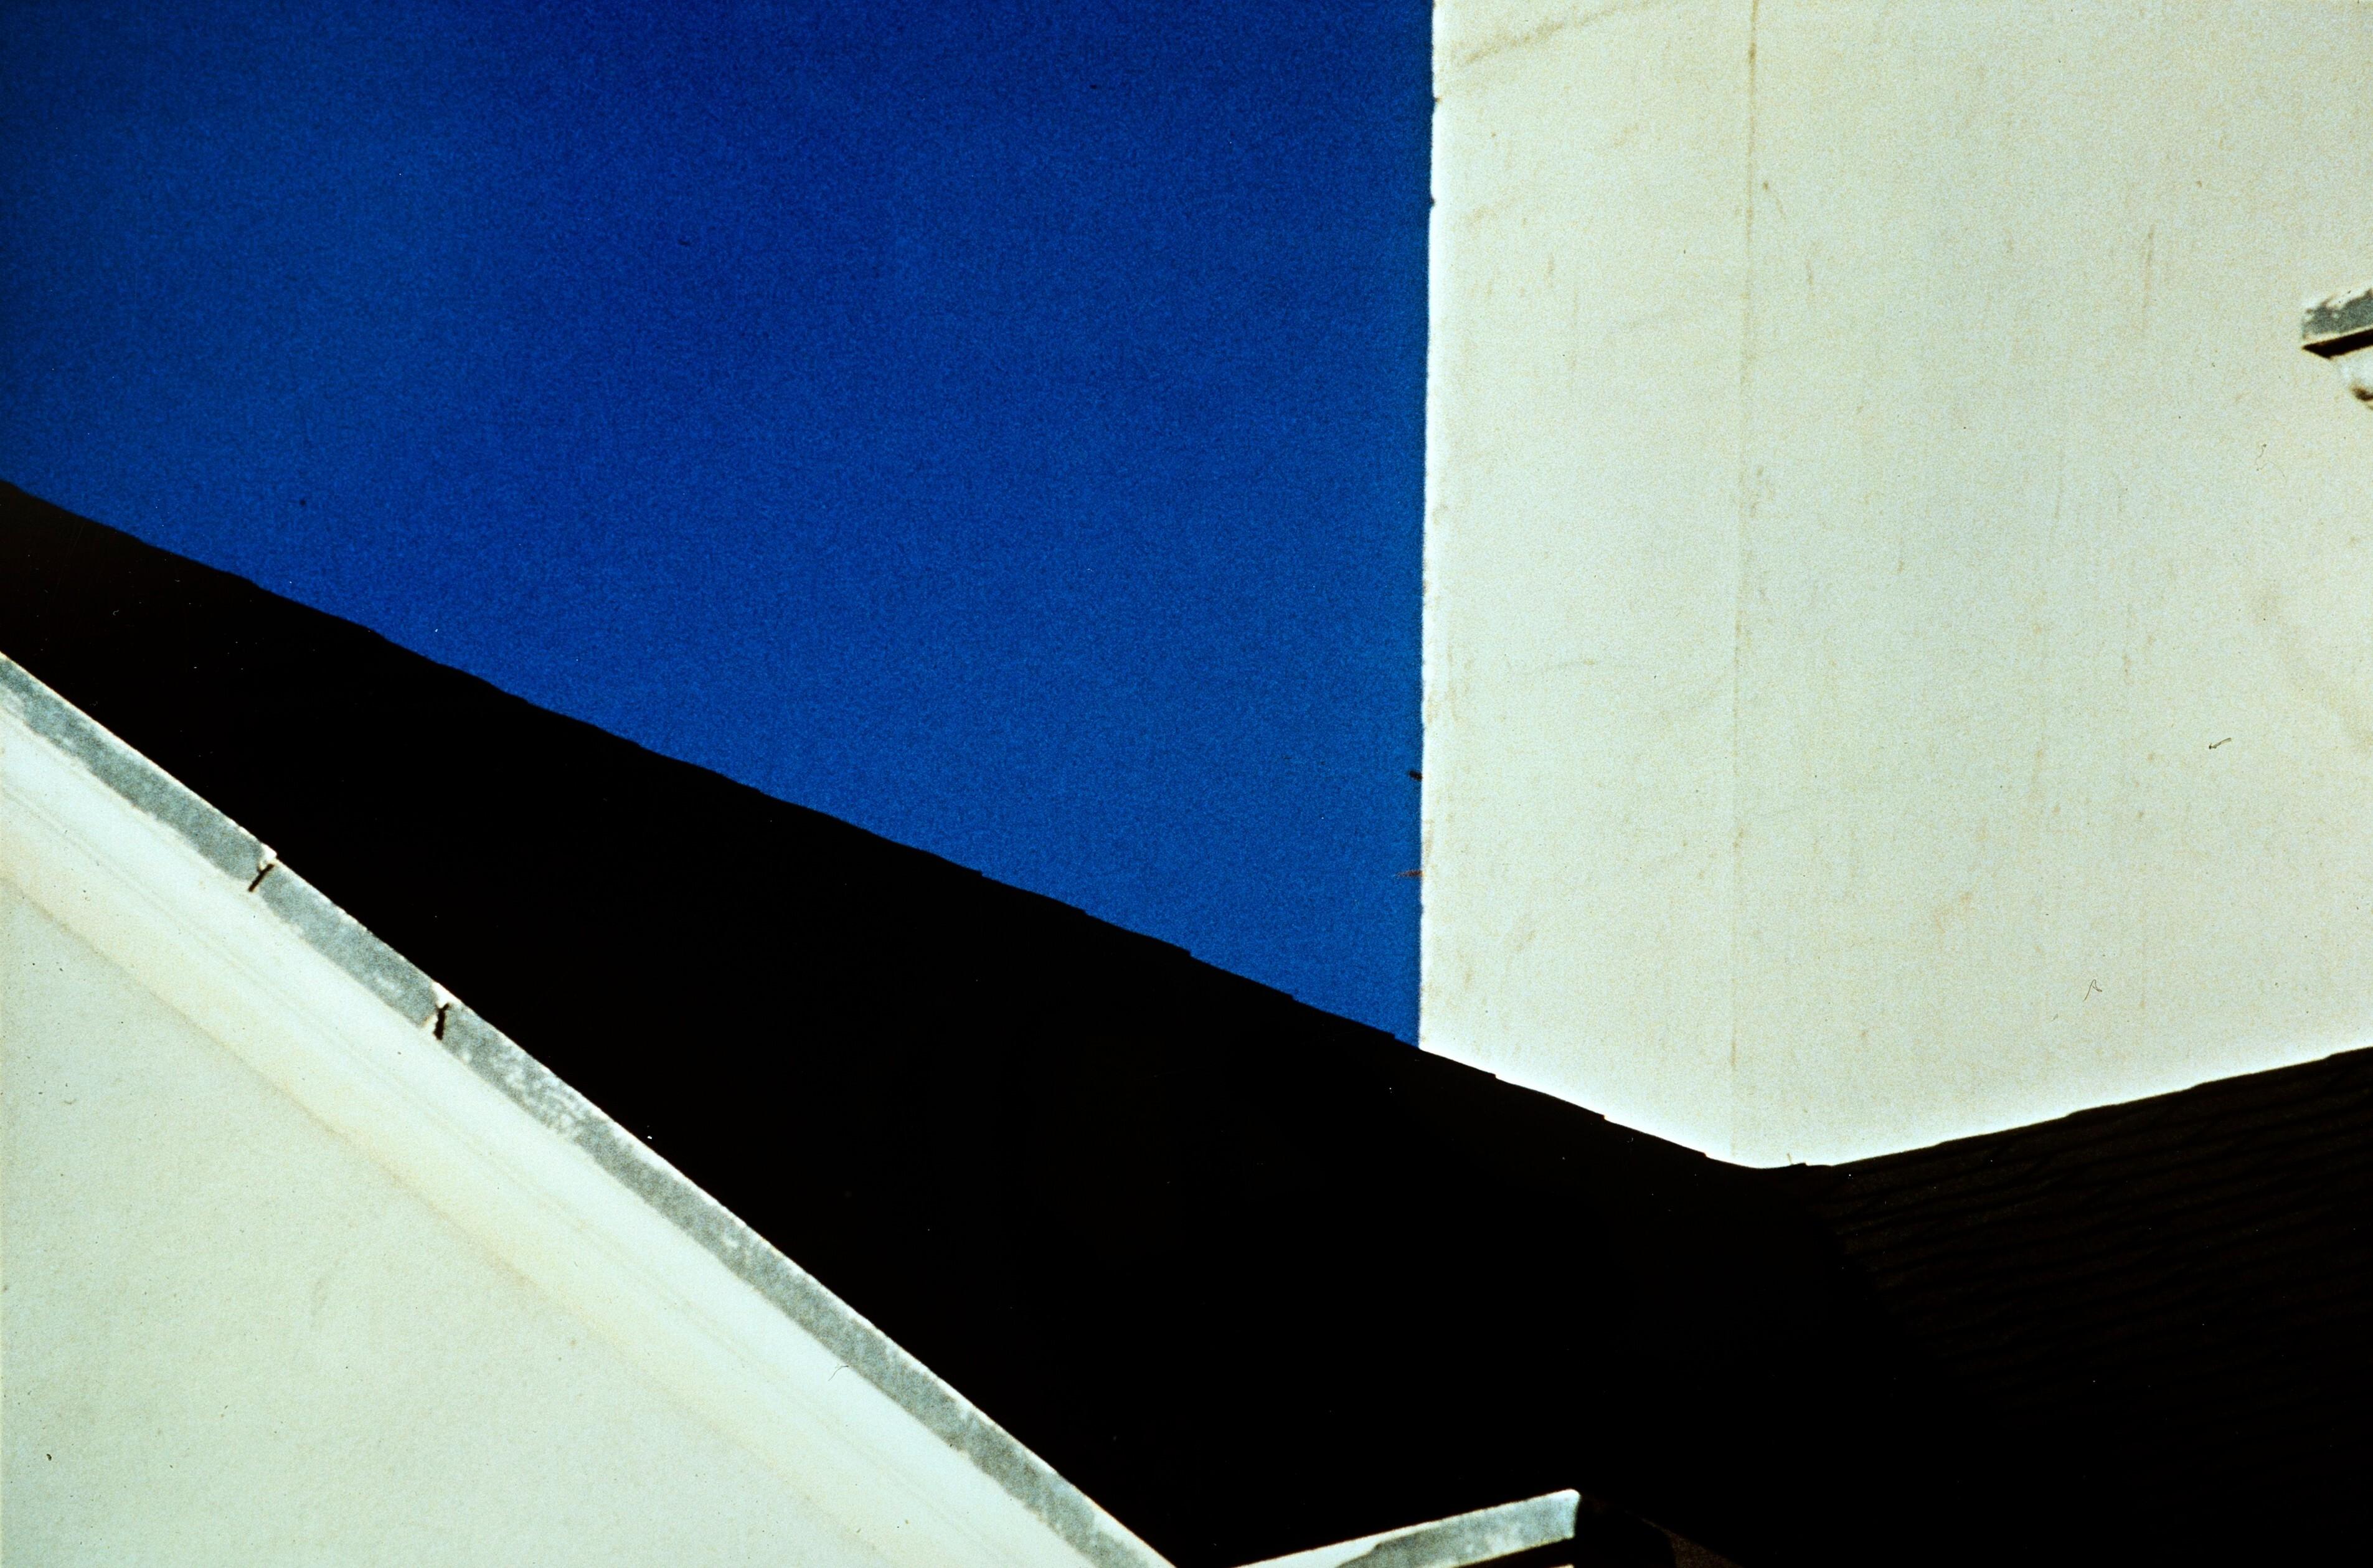 Абстракция, 1979. Фотограф Франко Фонтана